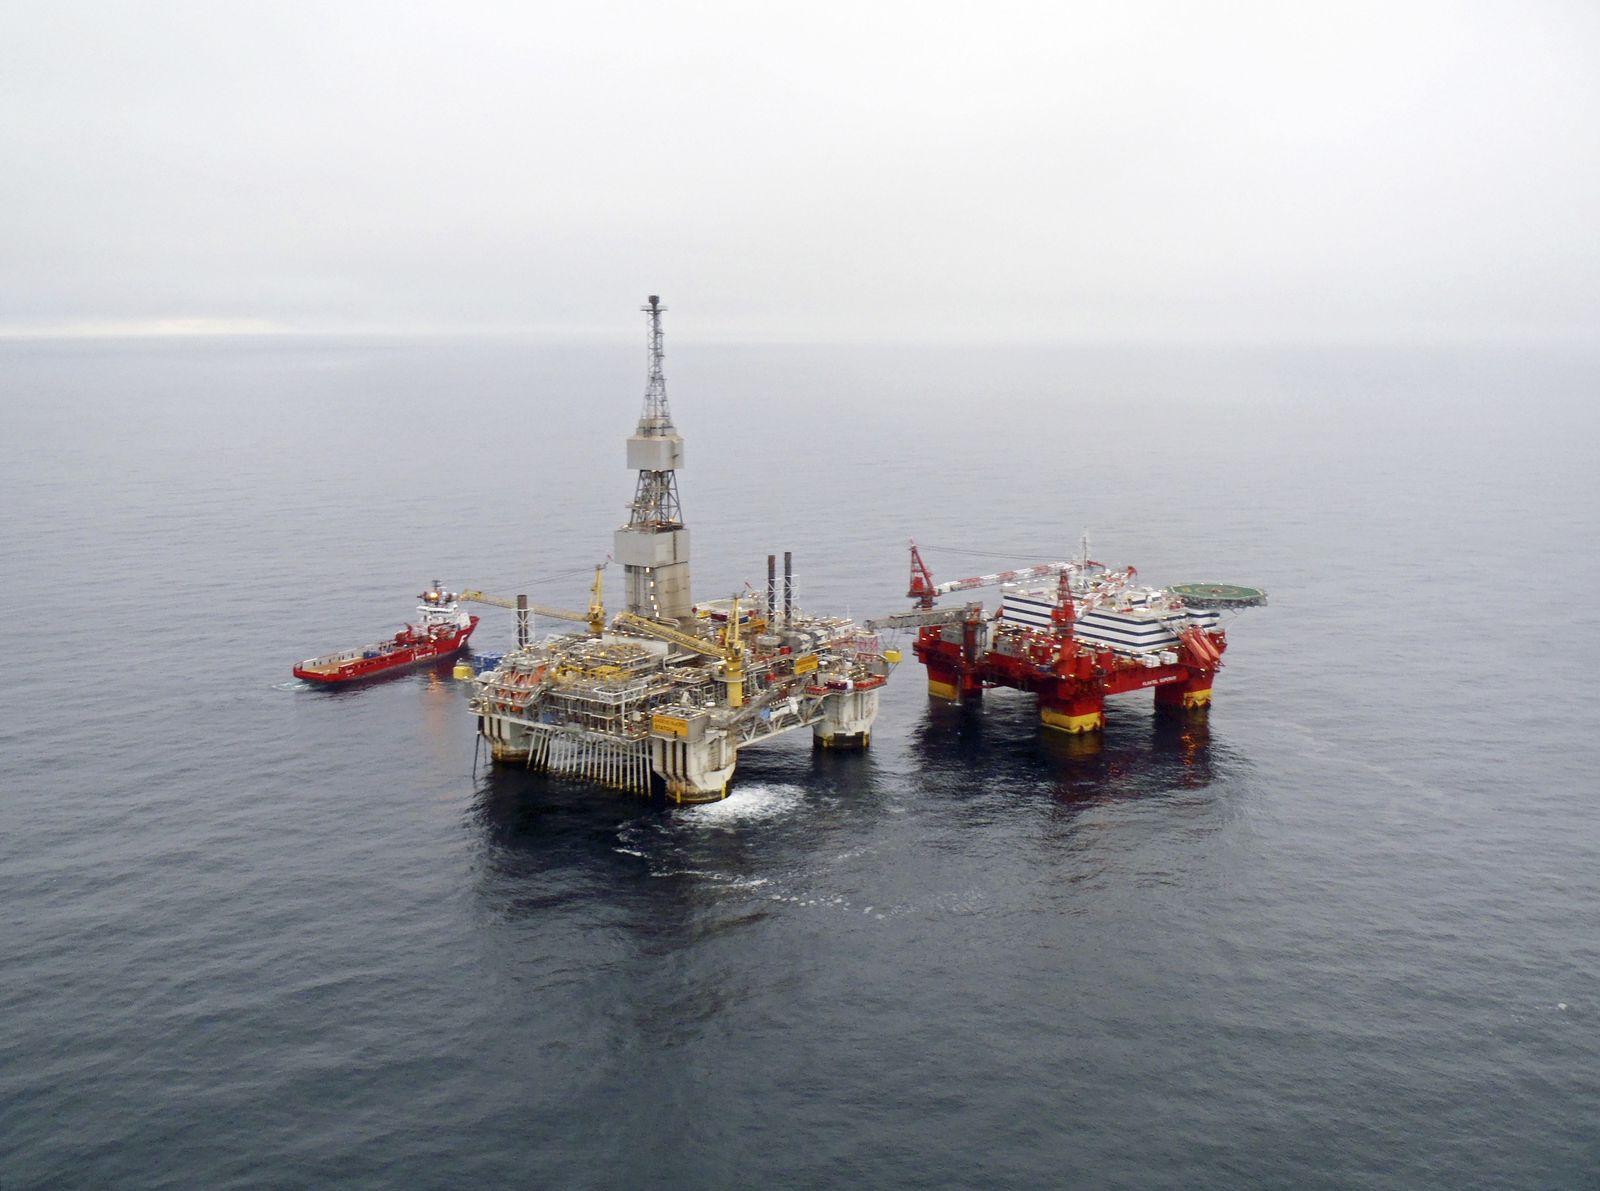 Statoil / Öl / Gas / Plattform / Bohrinsel